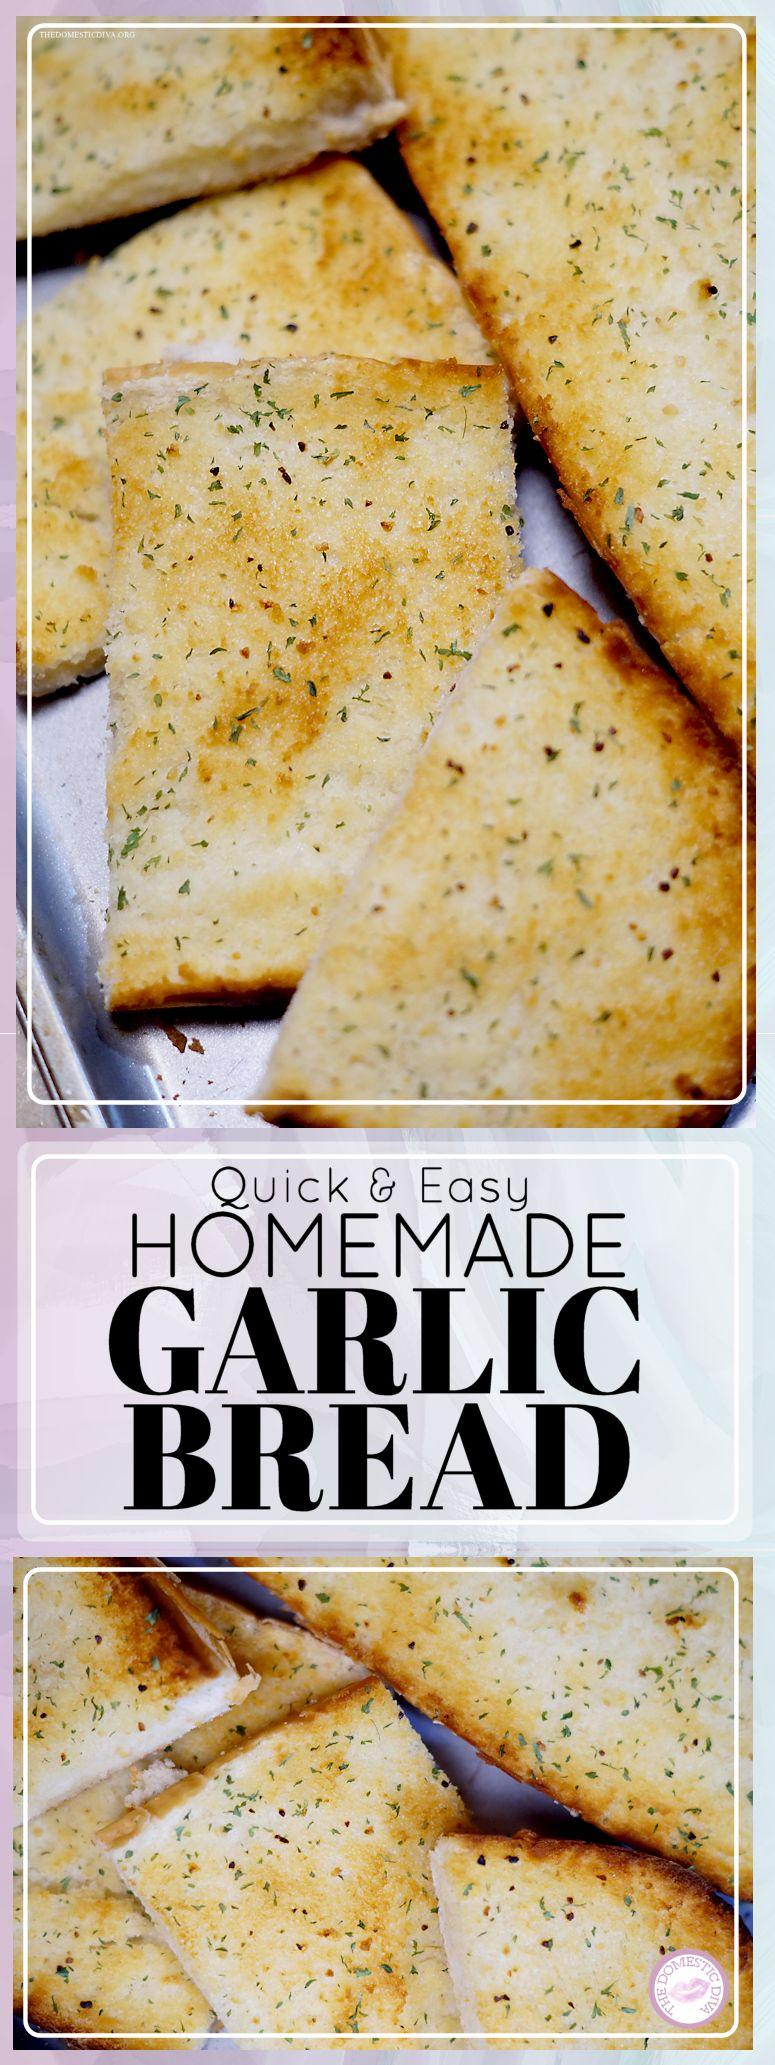 The Easiest Homemade Garlic Bread Recipe